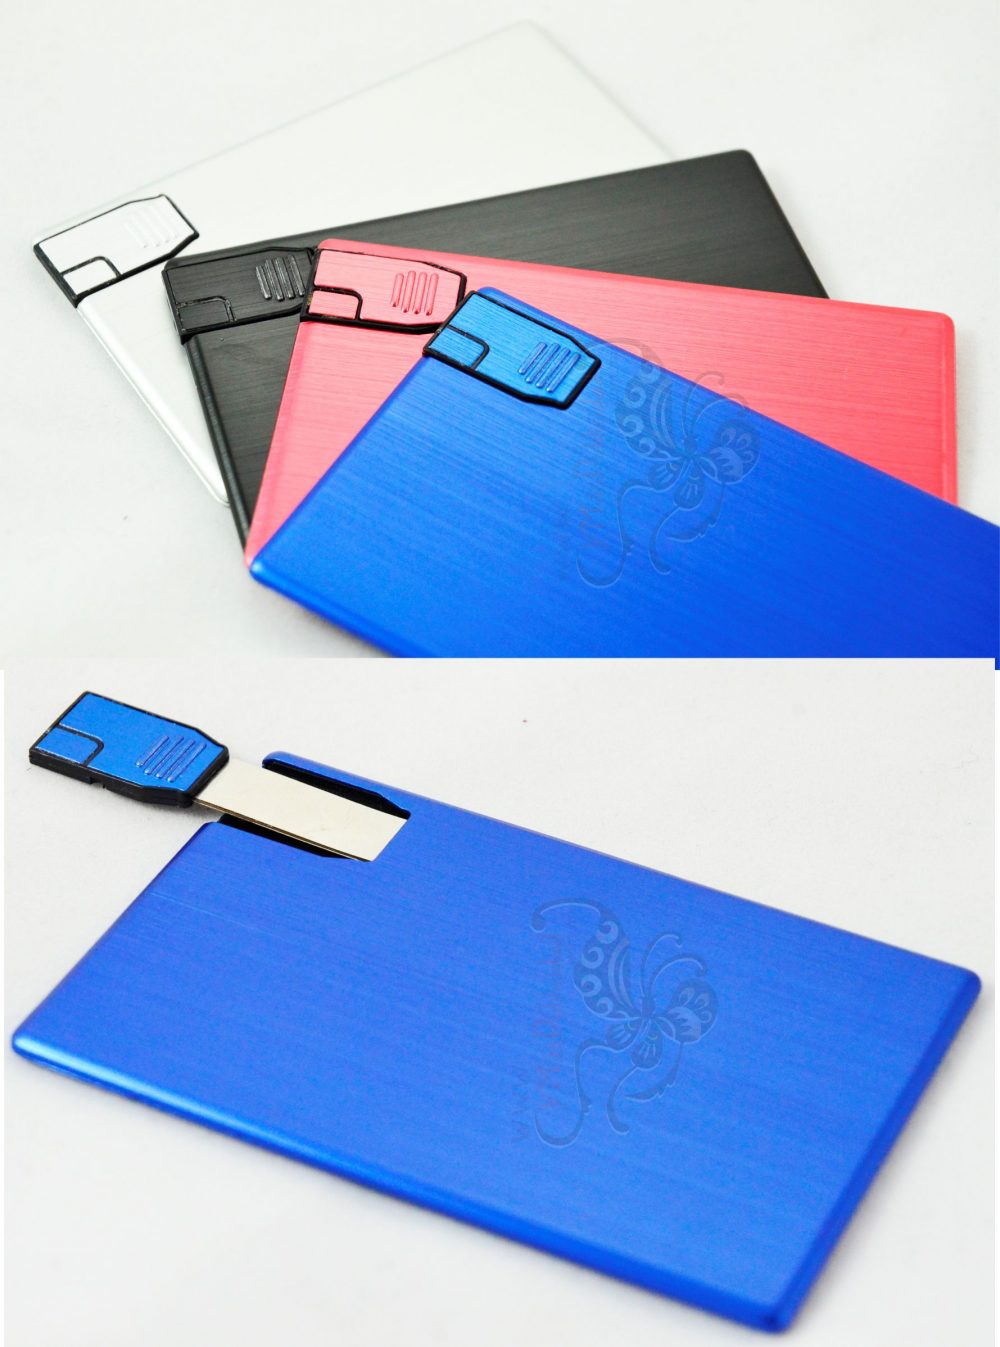 USB 004 Y 107